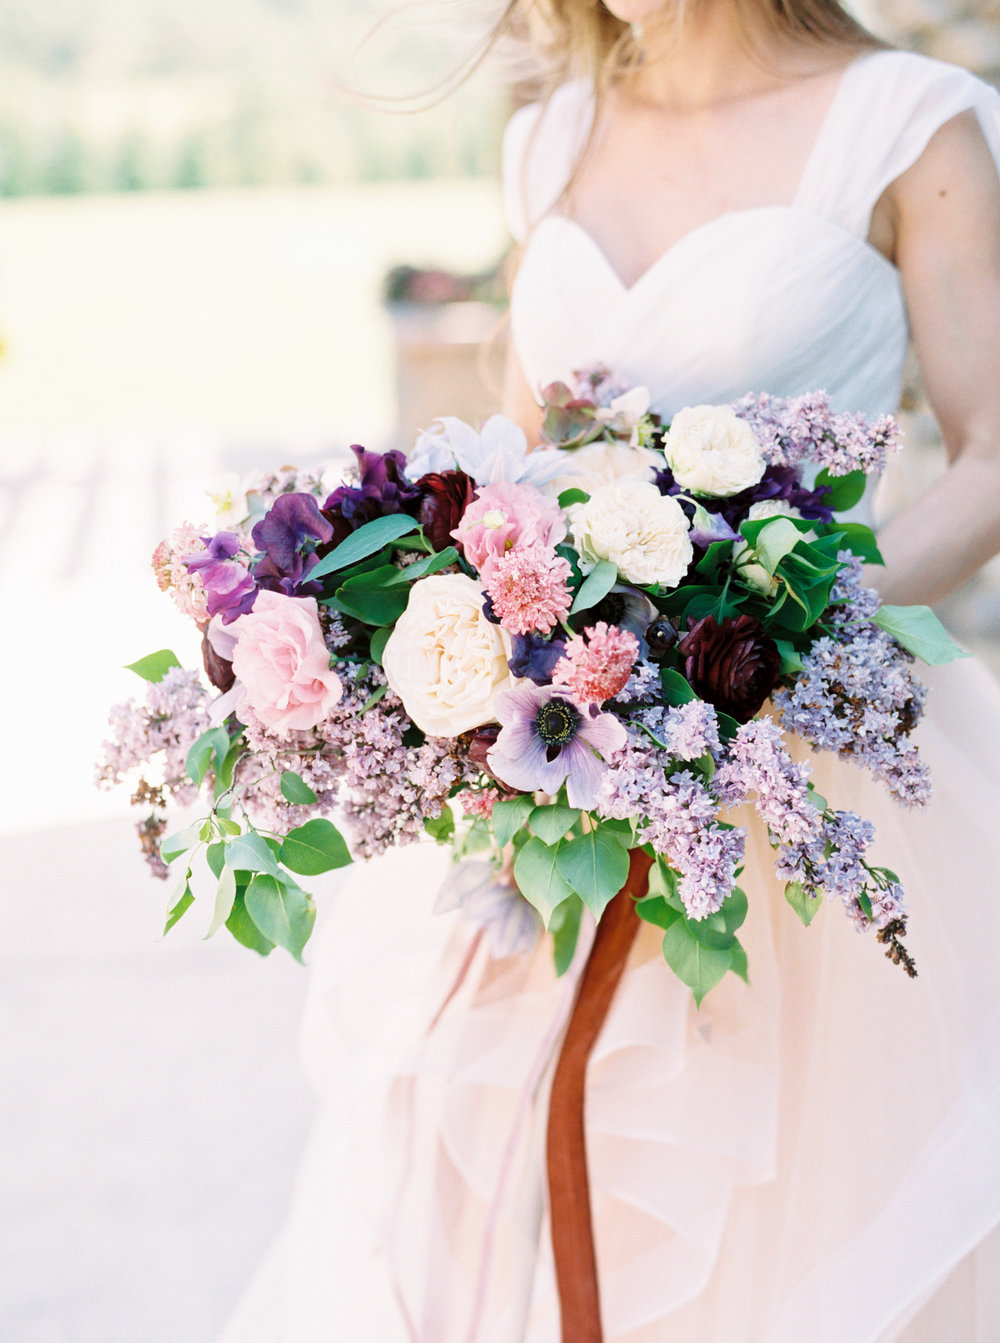 This-Love-of-Yours-Kirigin-Cellars-Flower-Arch-Styled-Shoot-046.jpg